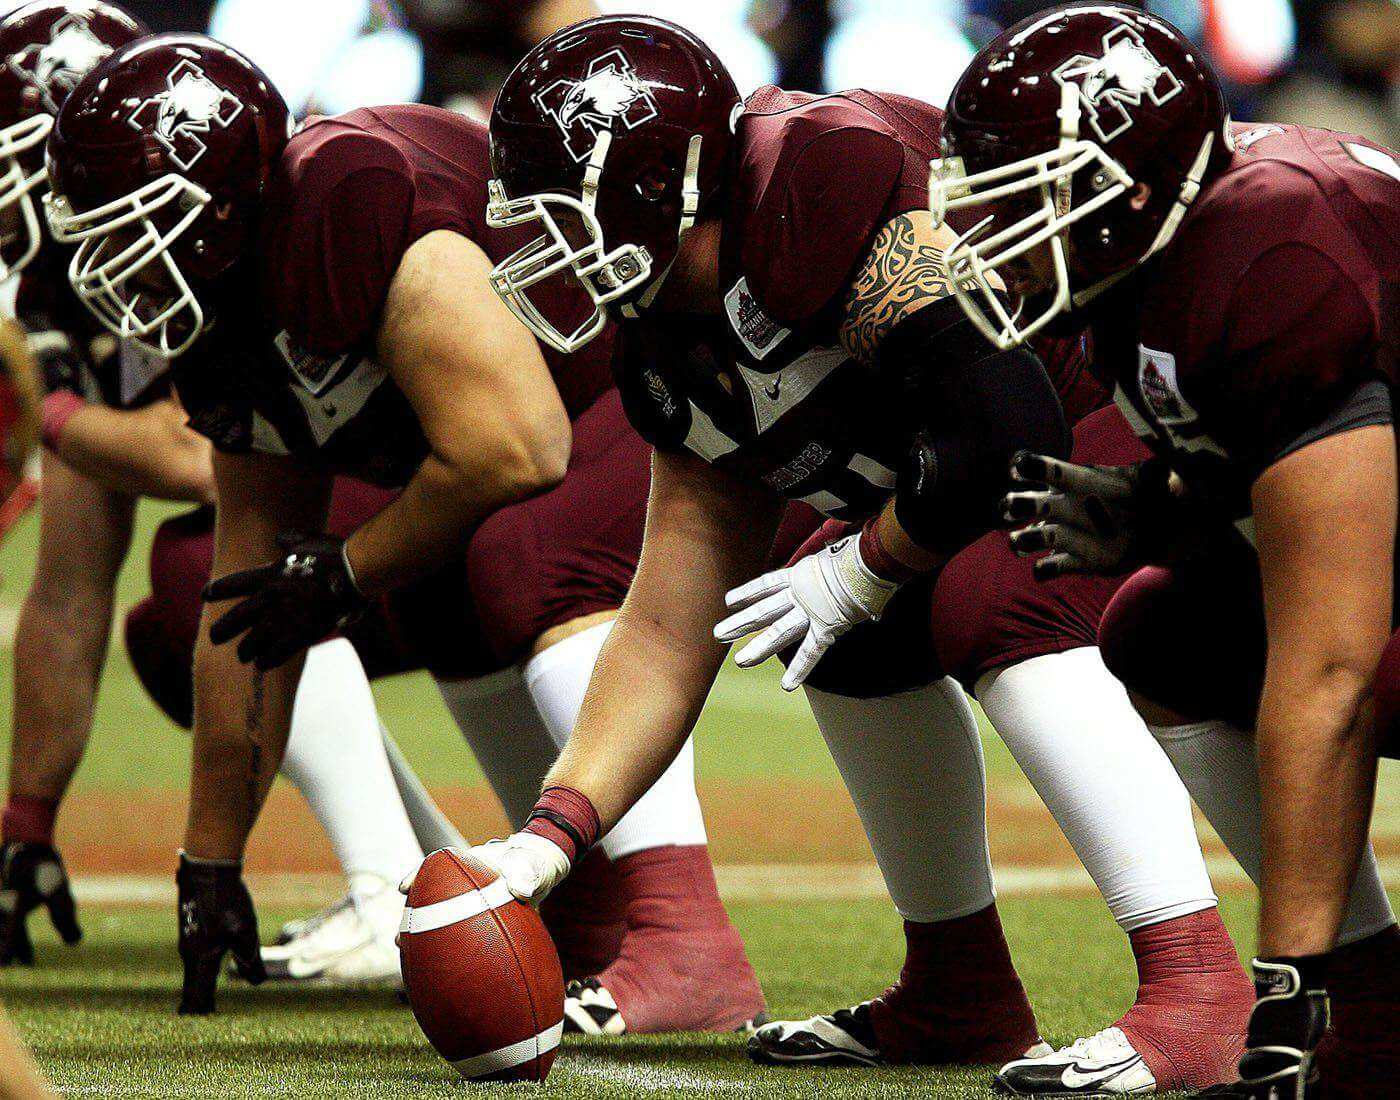 Canadian Rules Football gridiron football